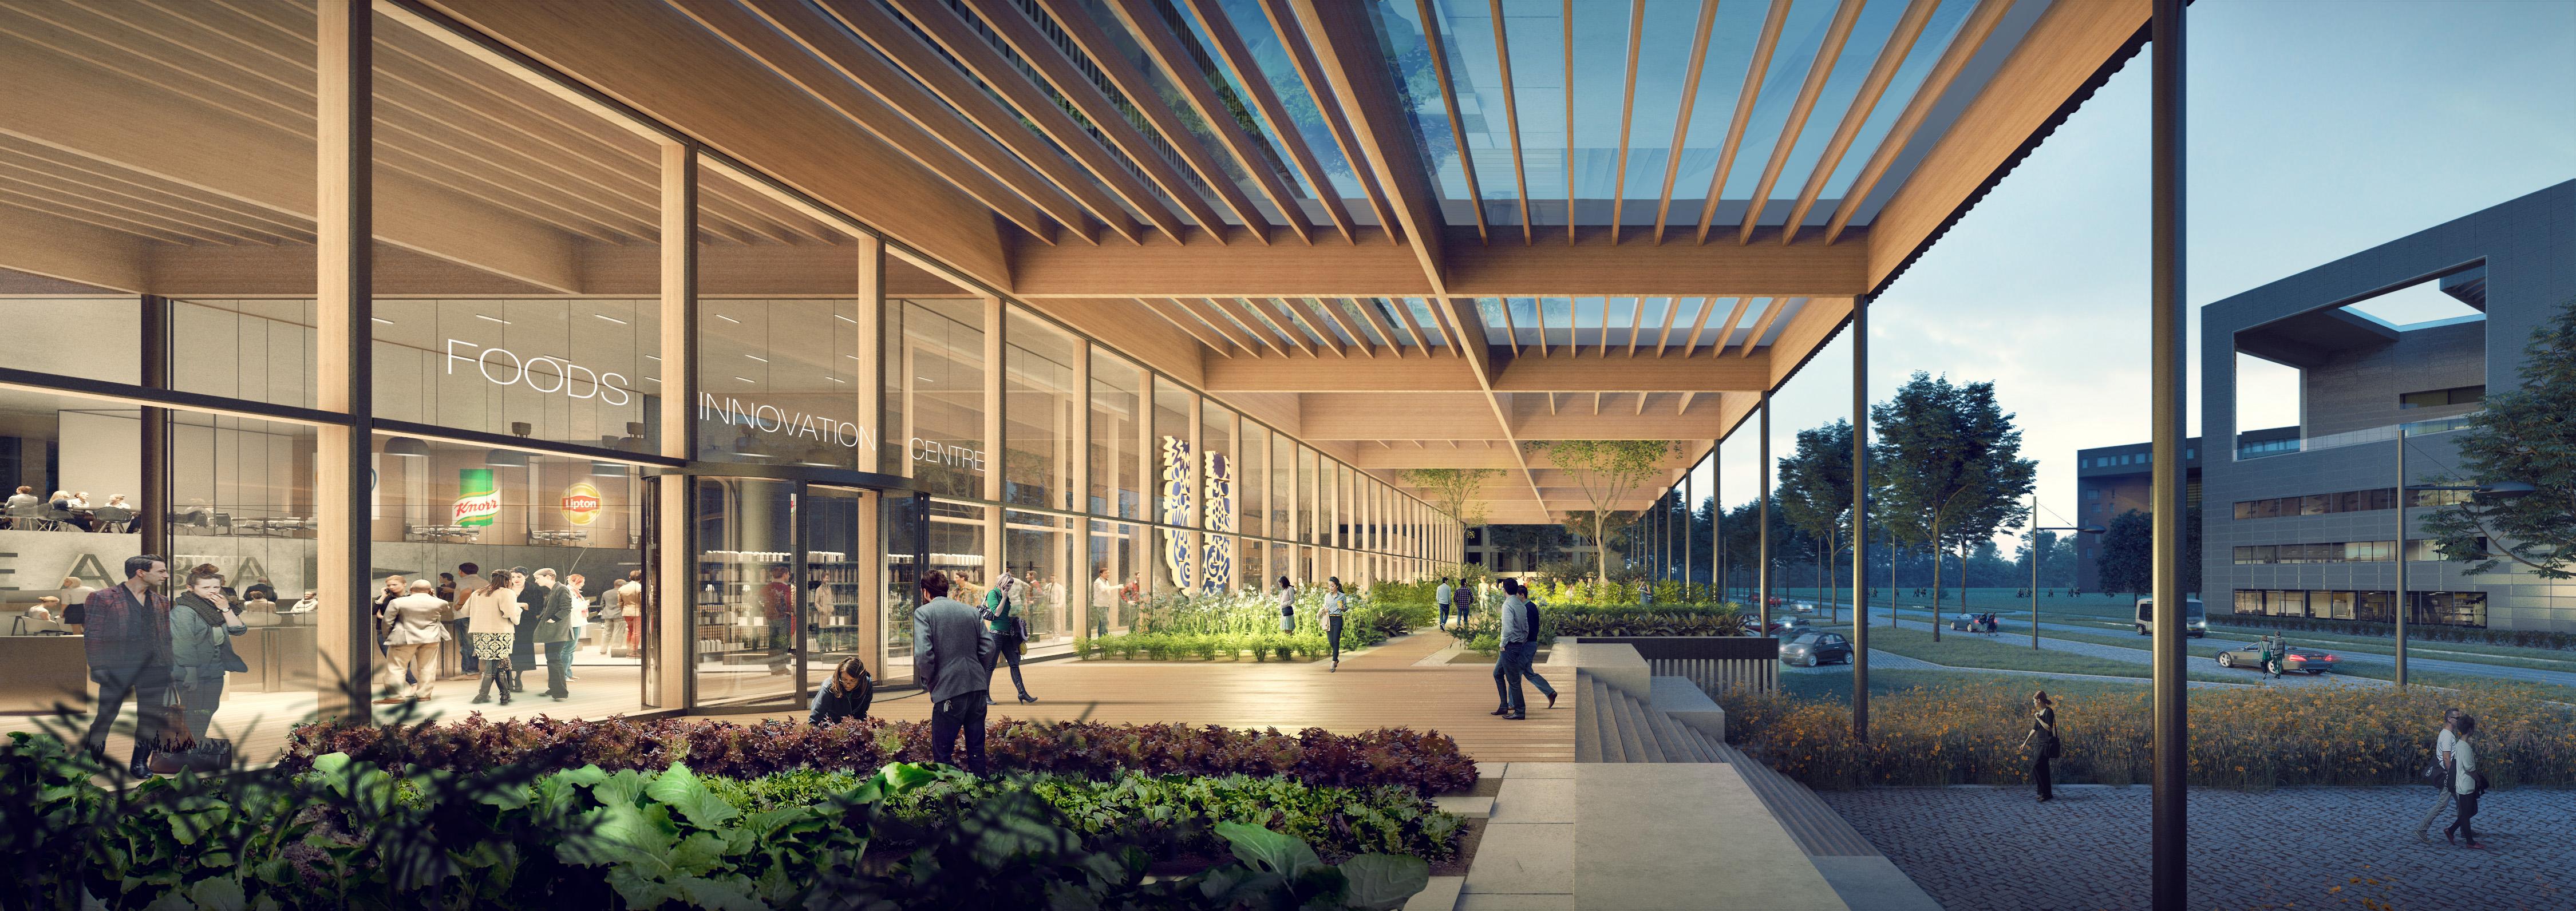 Unilever building exterior